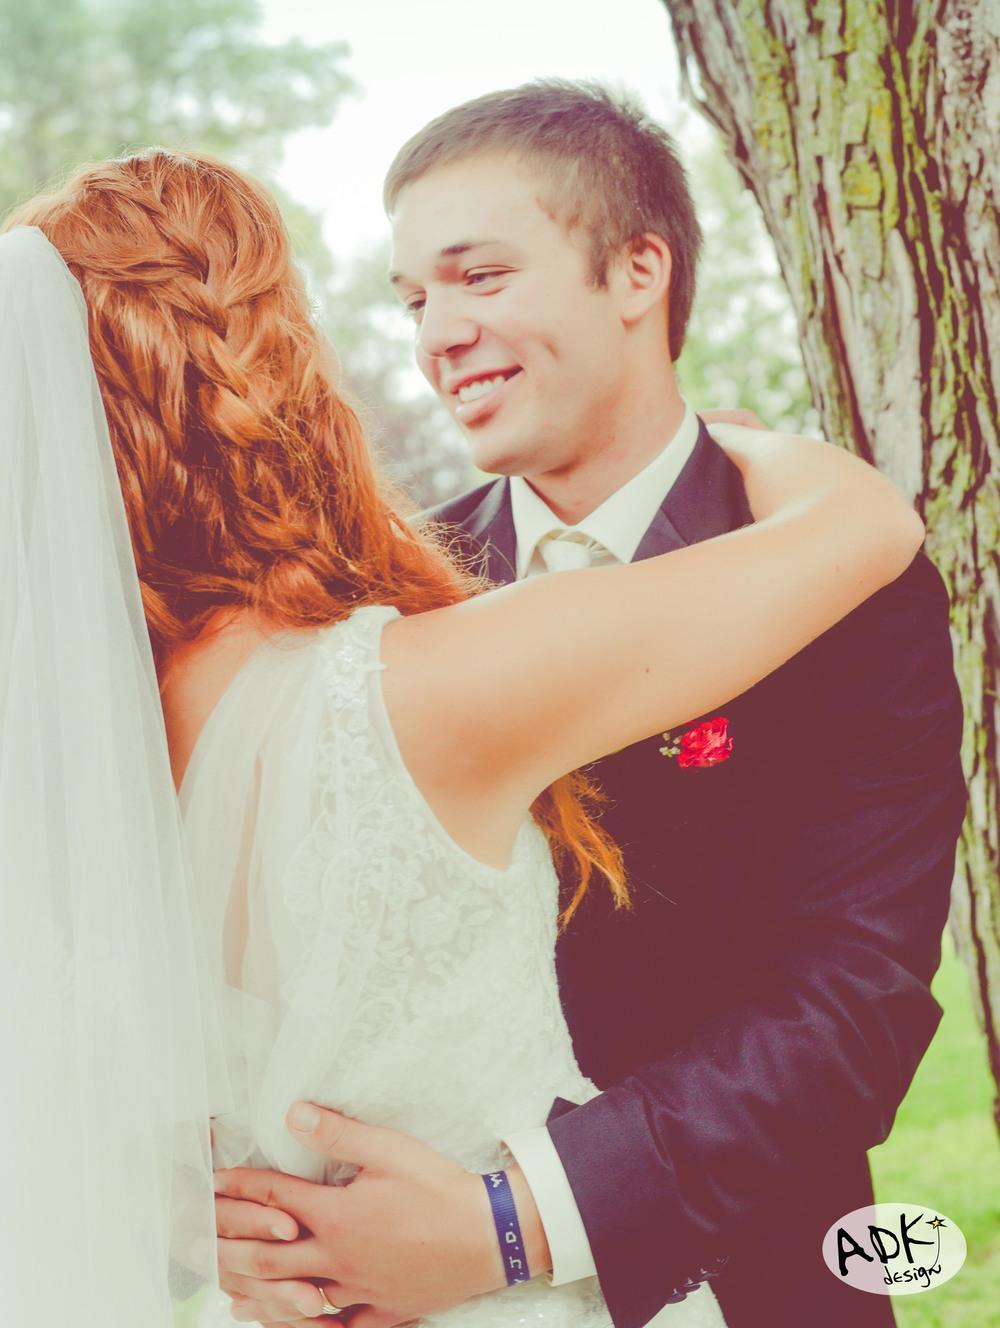 krcil_wedding-492.jpg